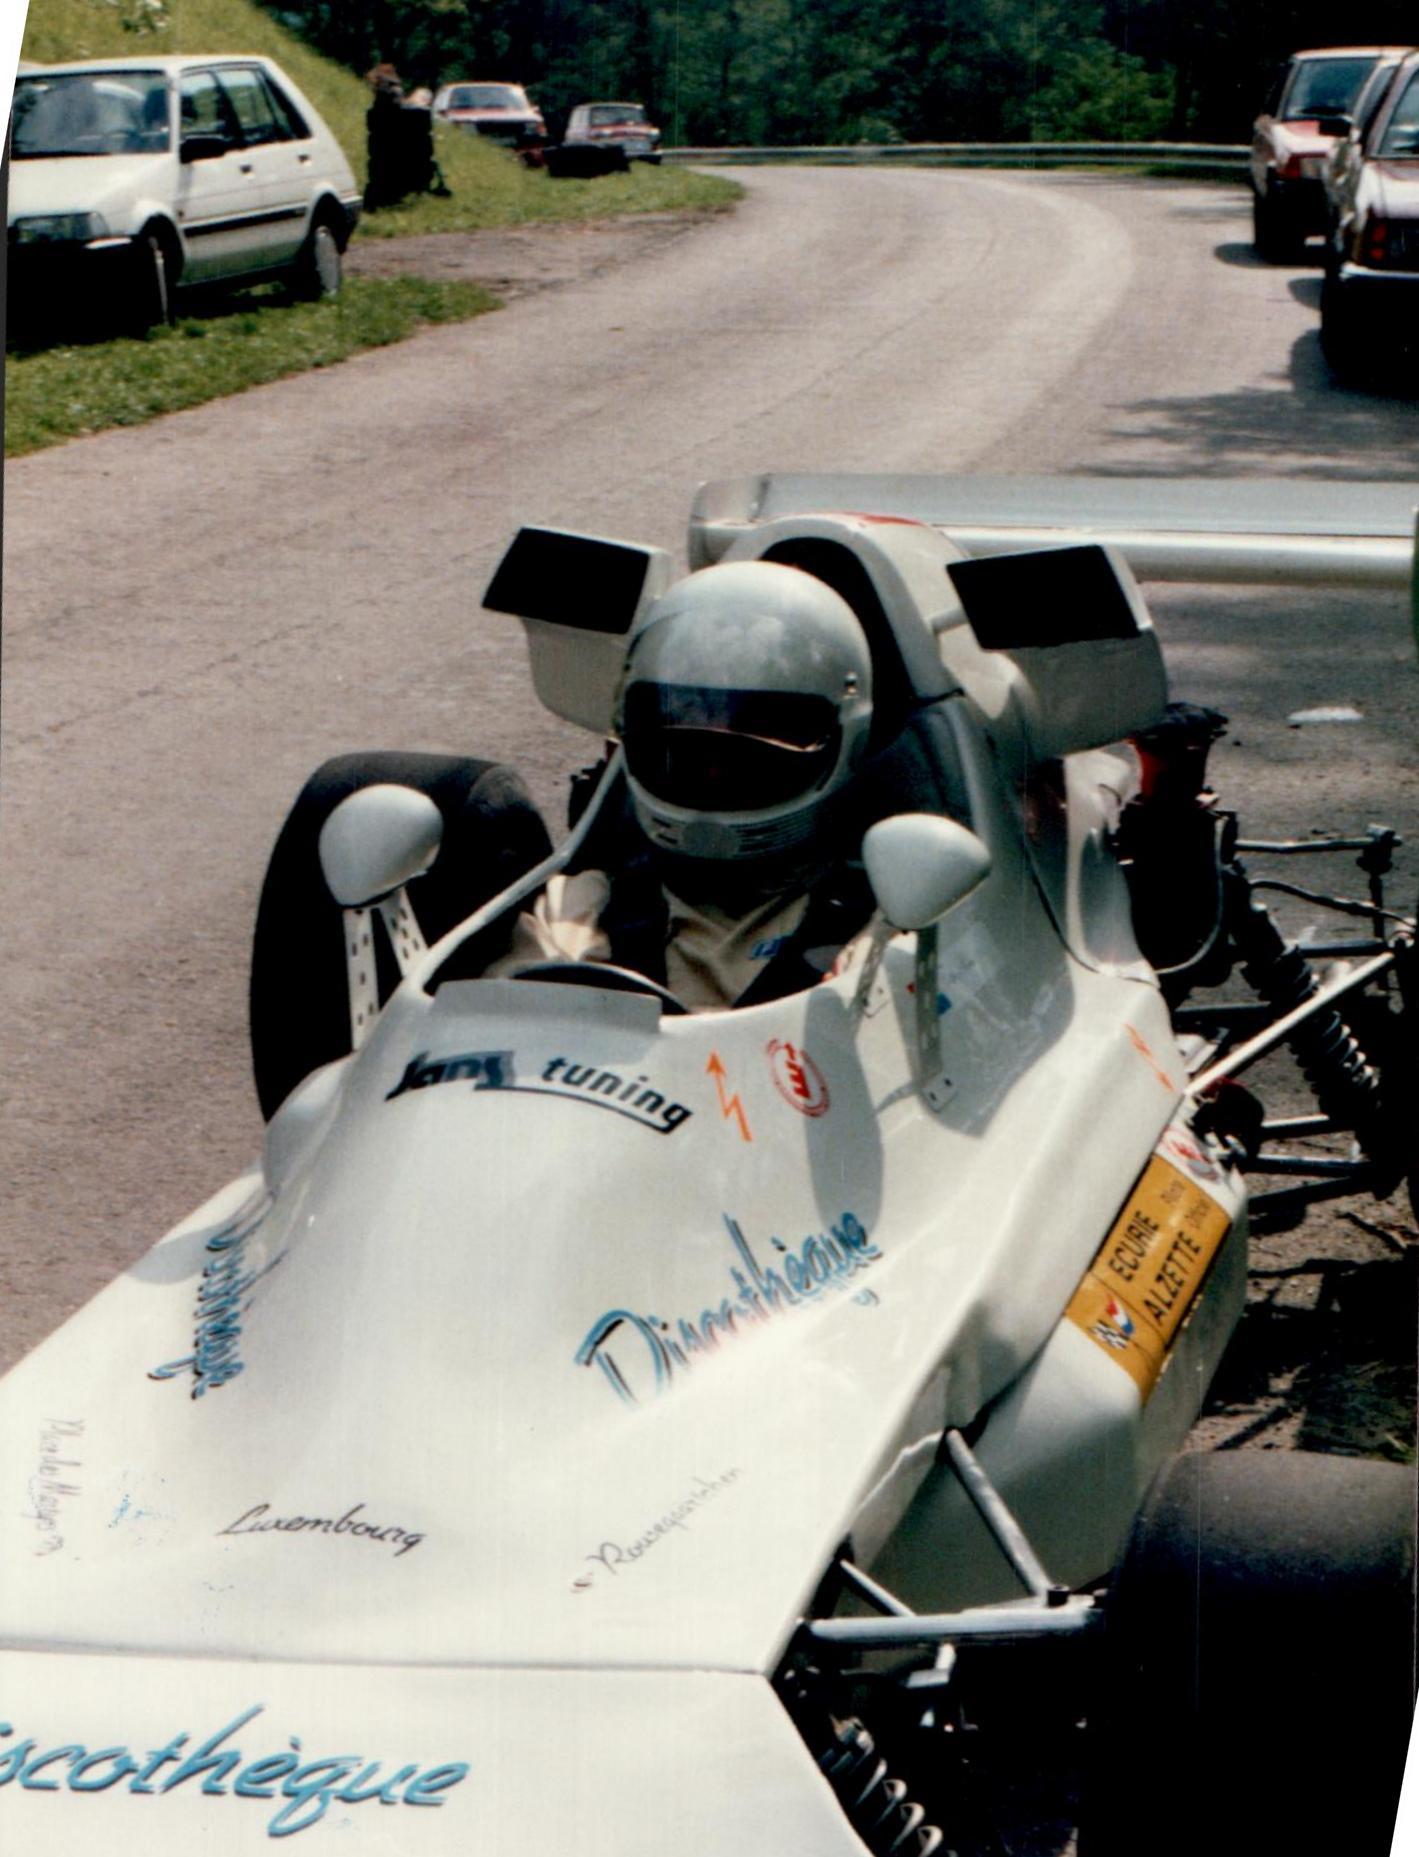 1985 Rosport